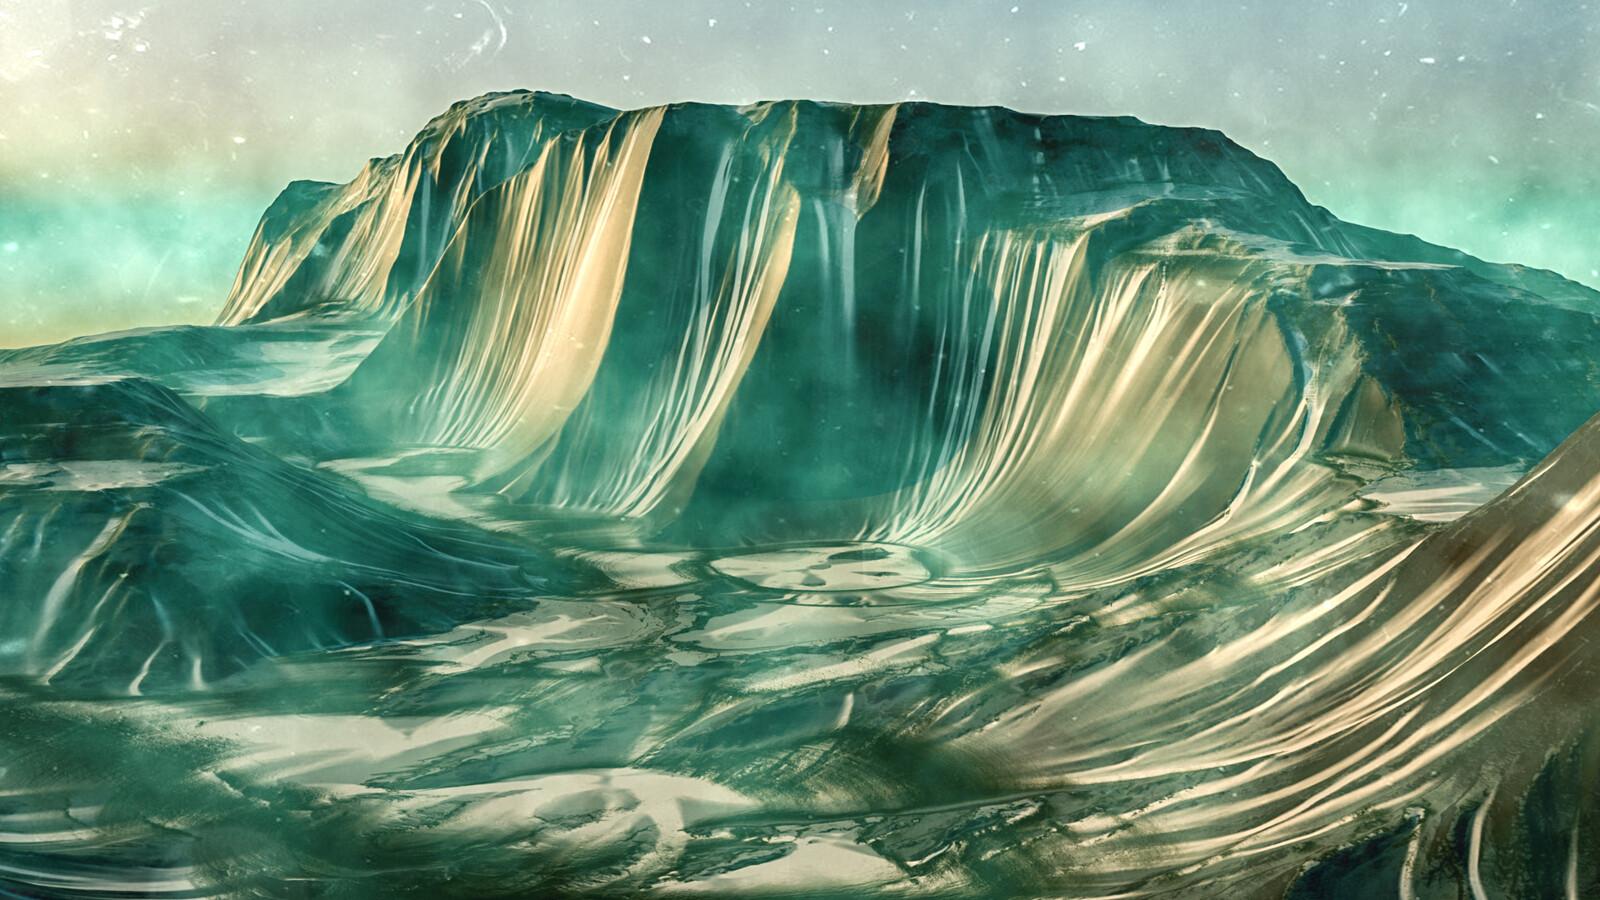 Fantasy cliffs concept